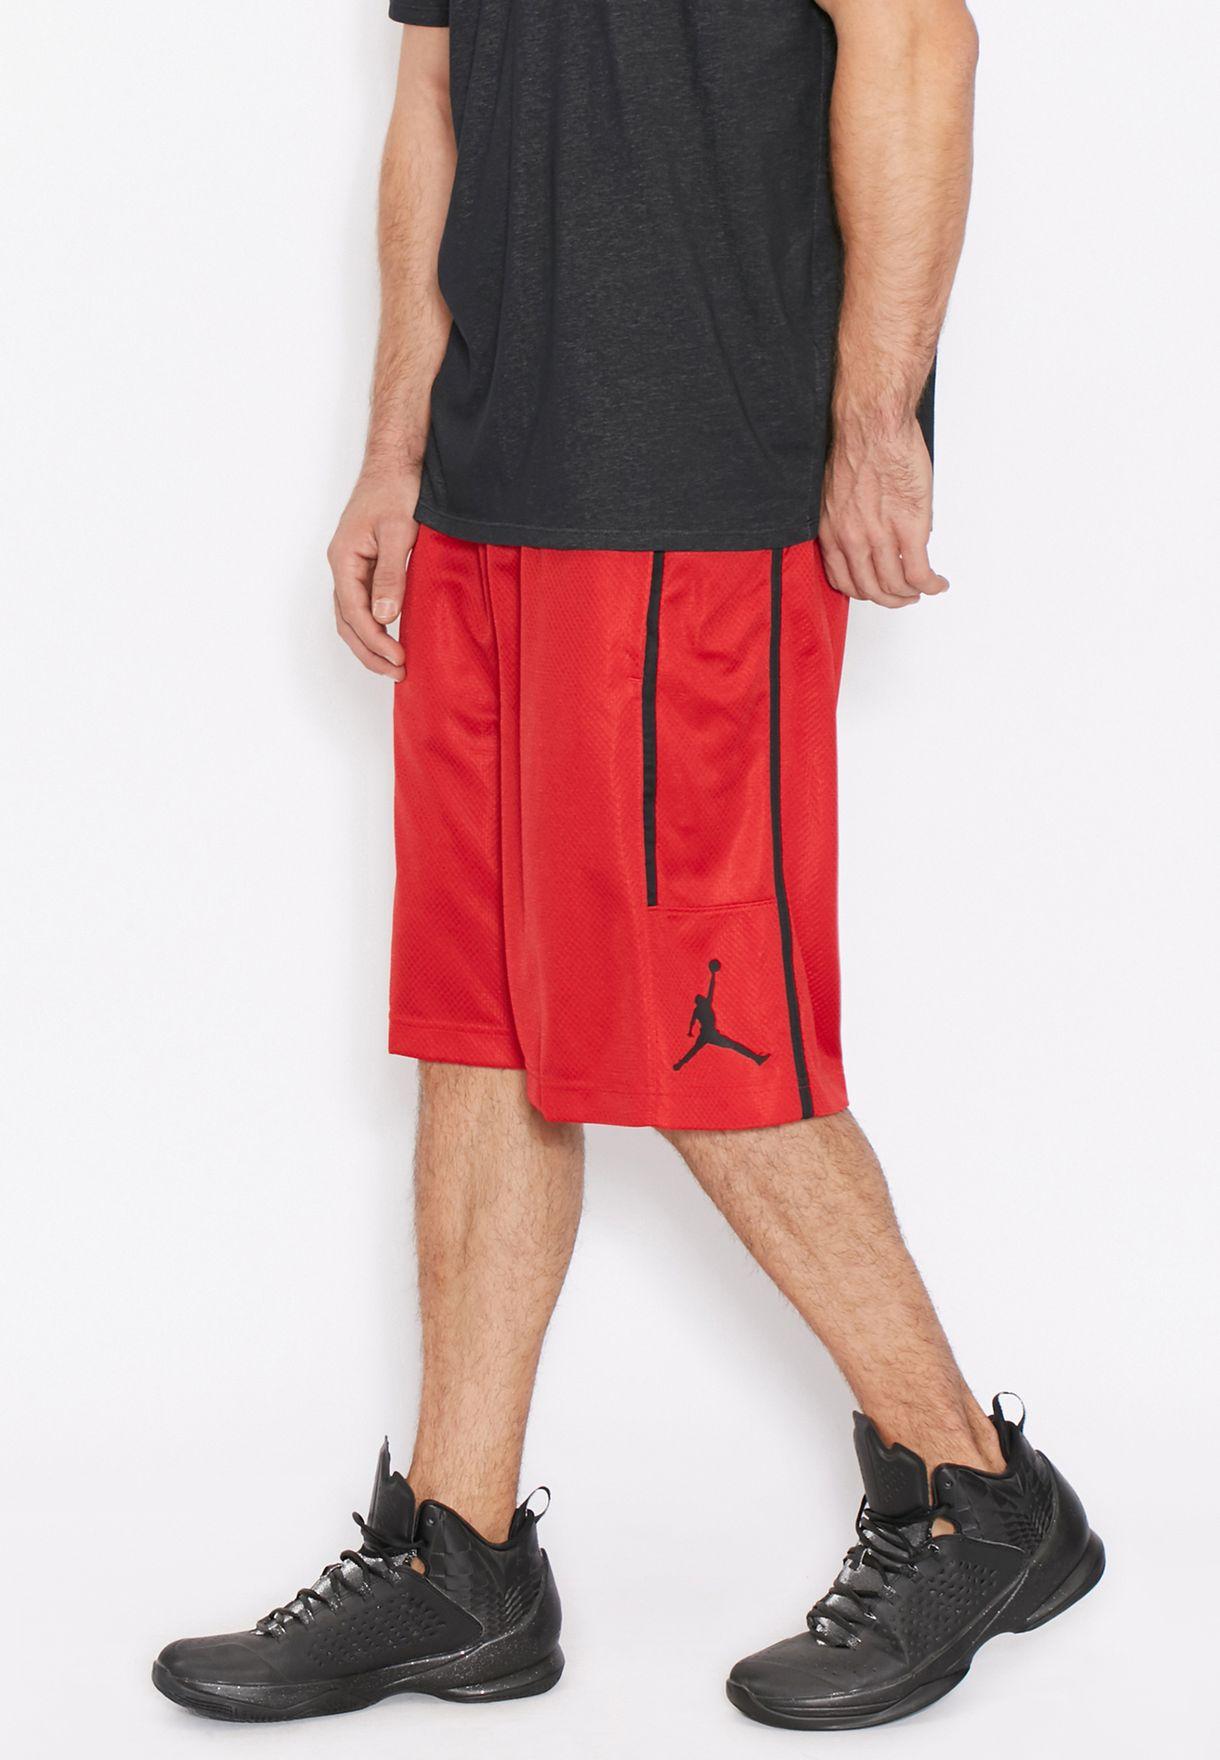 d4bb47c1d9a Shop Nike red Jordan Crossover Shorts 811466-687 for Men in Bahrain ...